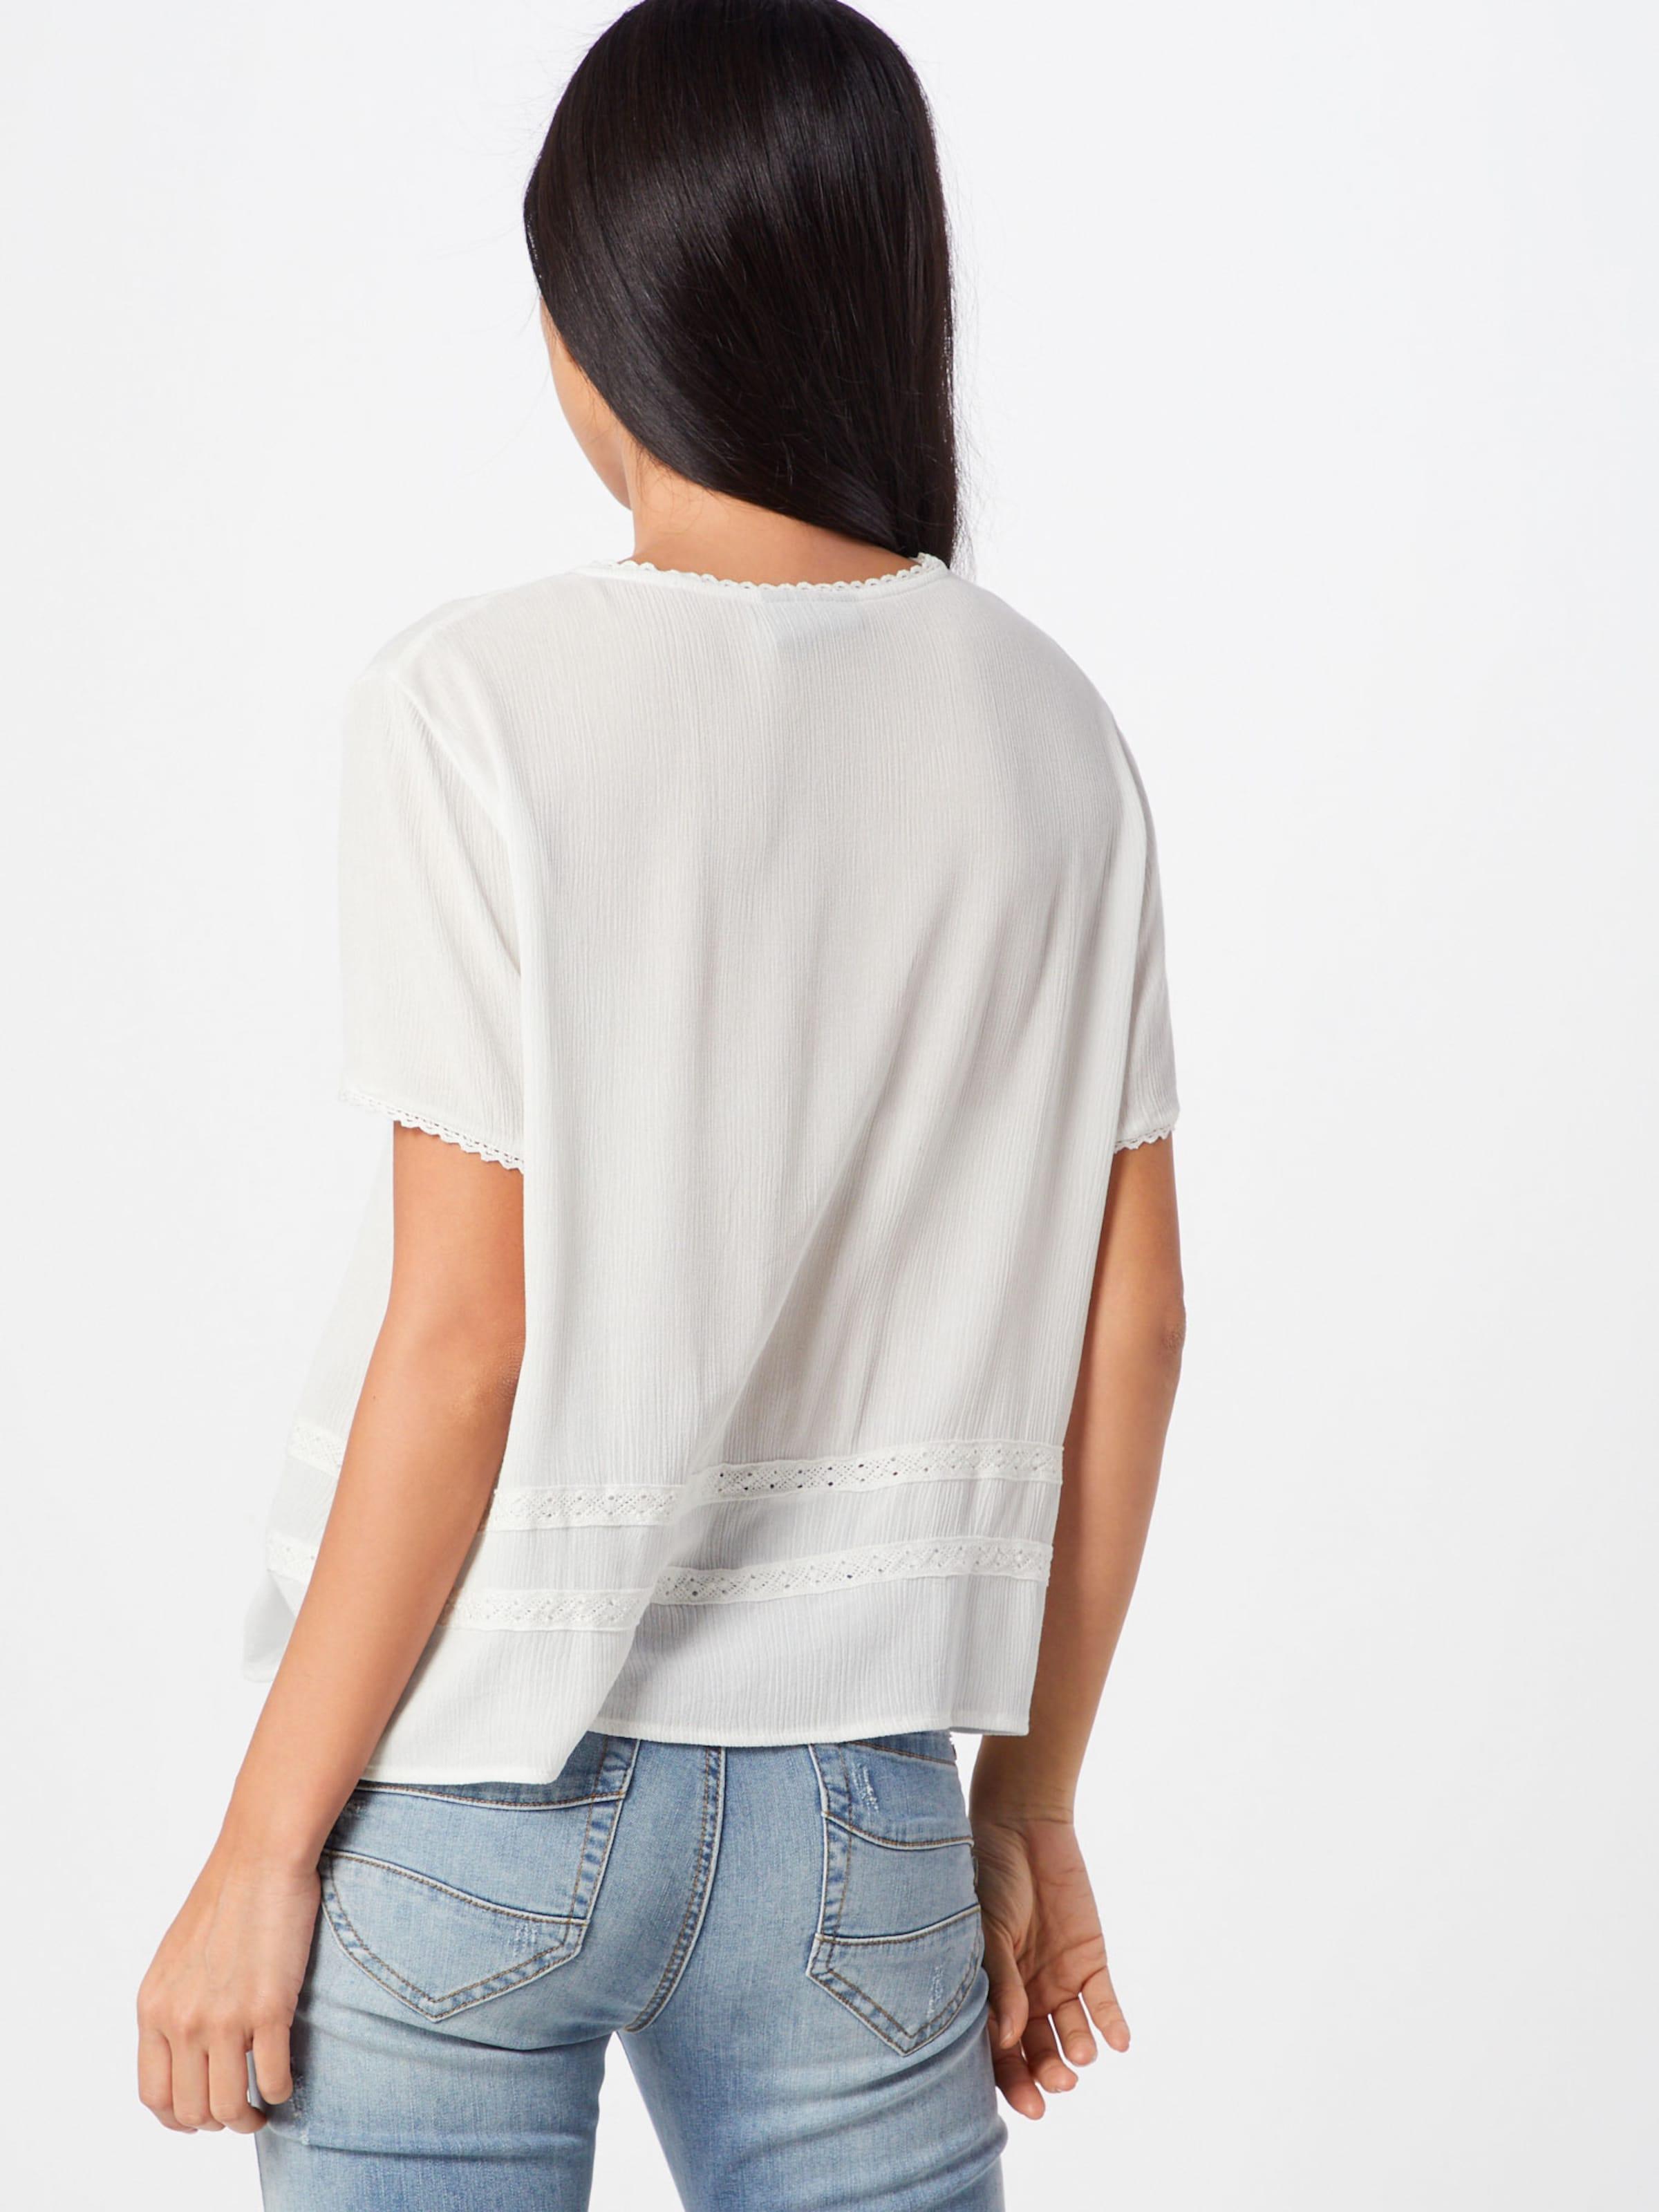 Shirt Shirt Weiß Object Object Object Weiß Object In Weiß In In Shirt UzMpqSVG